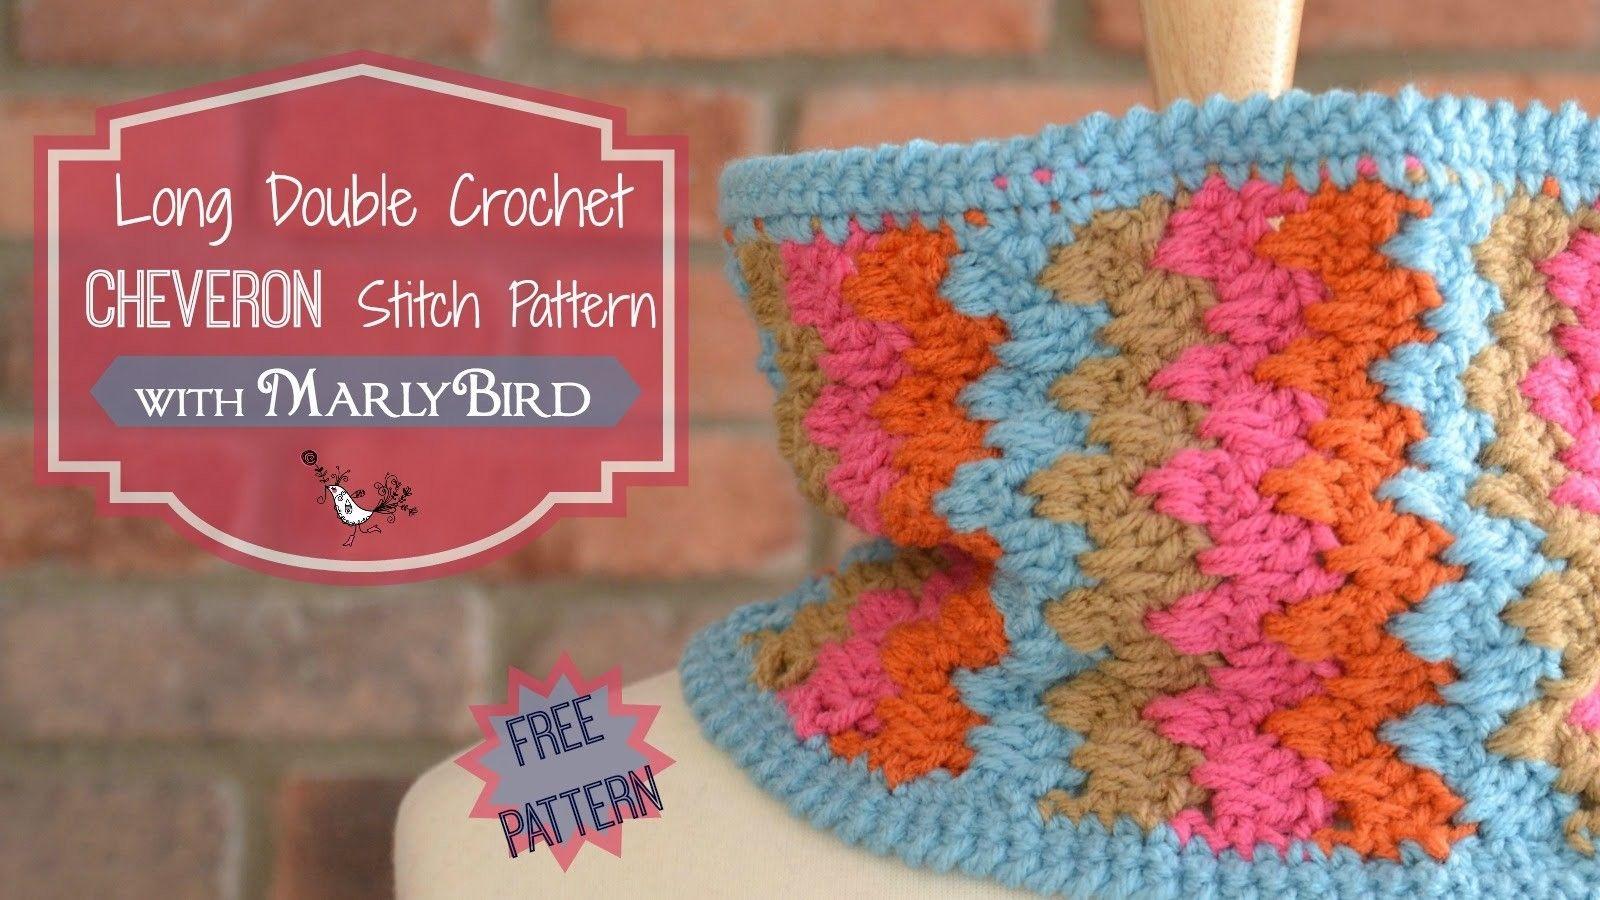 How To Crochet Long Double Crochet Chevron Stitch Pattern